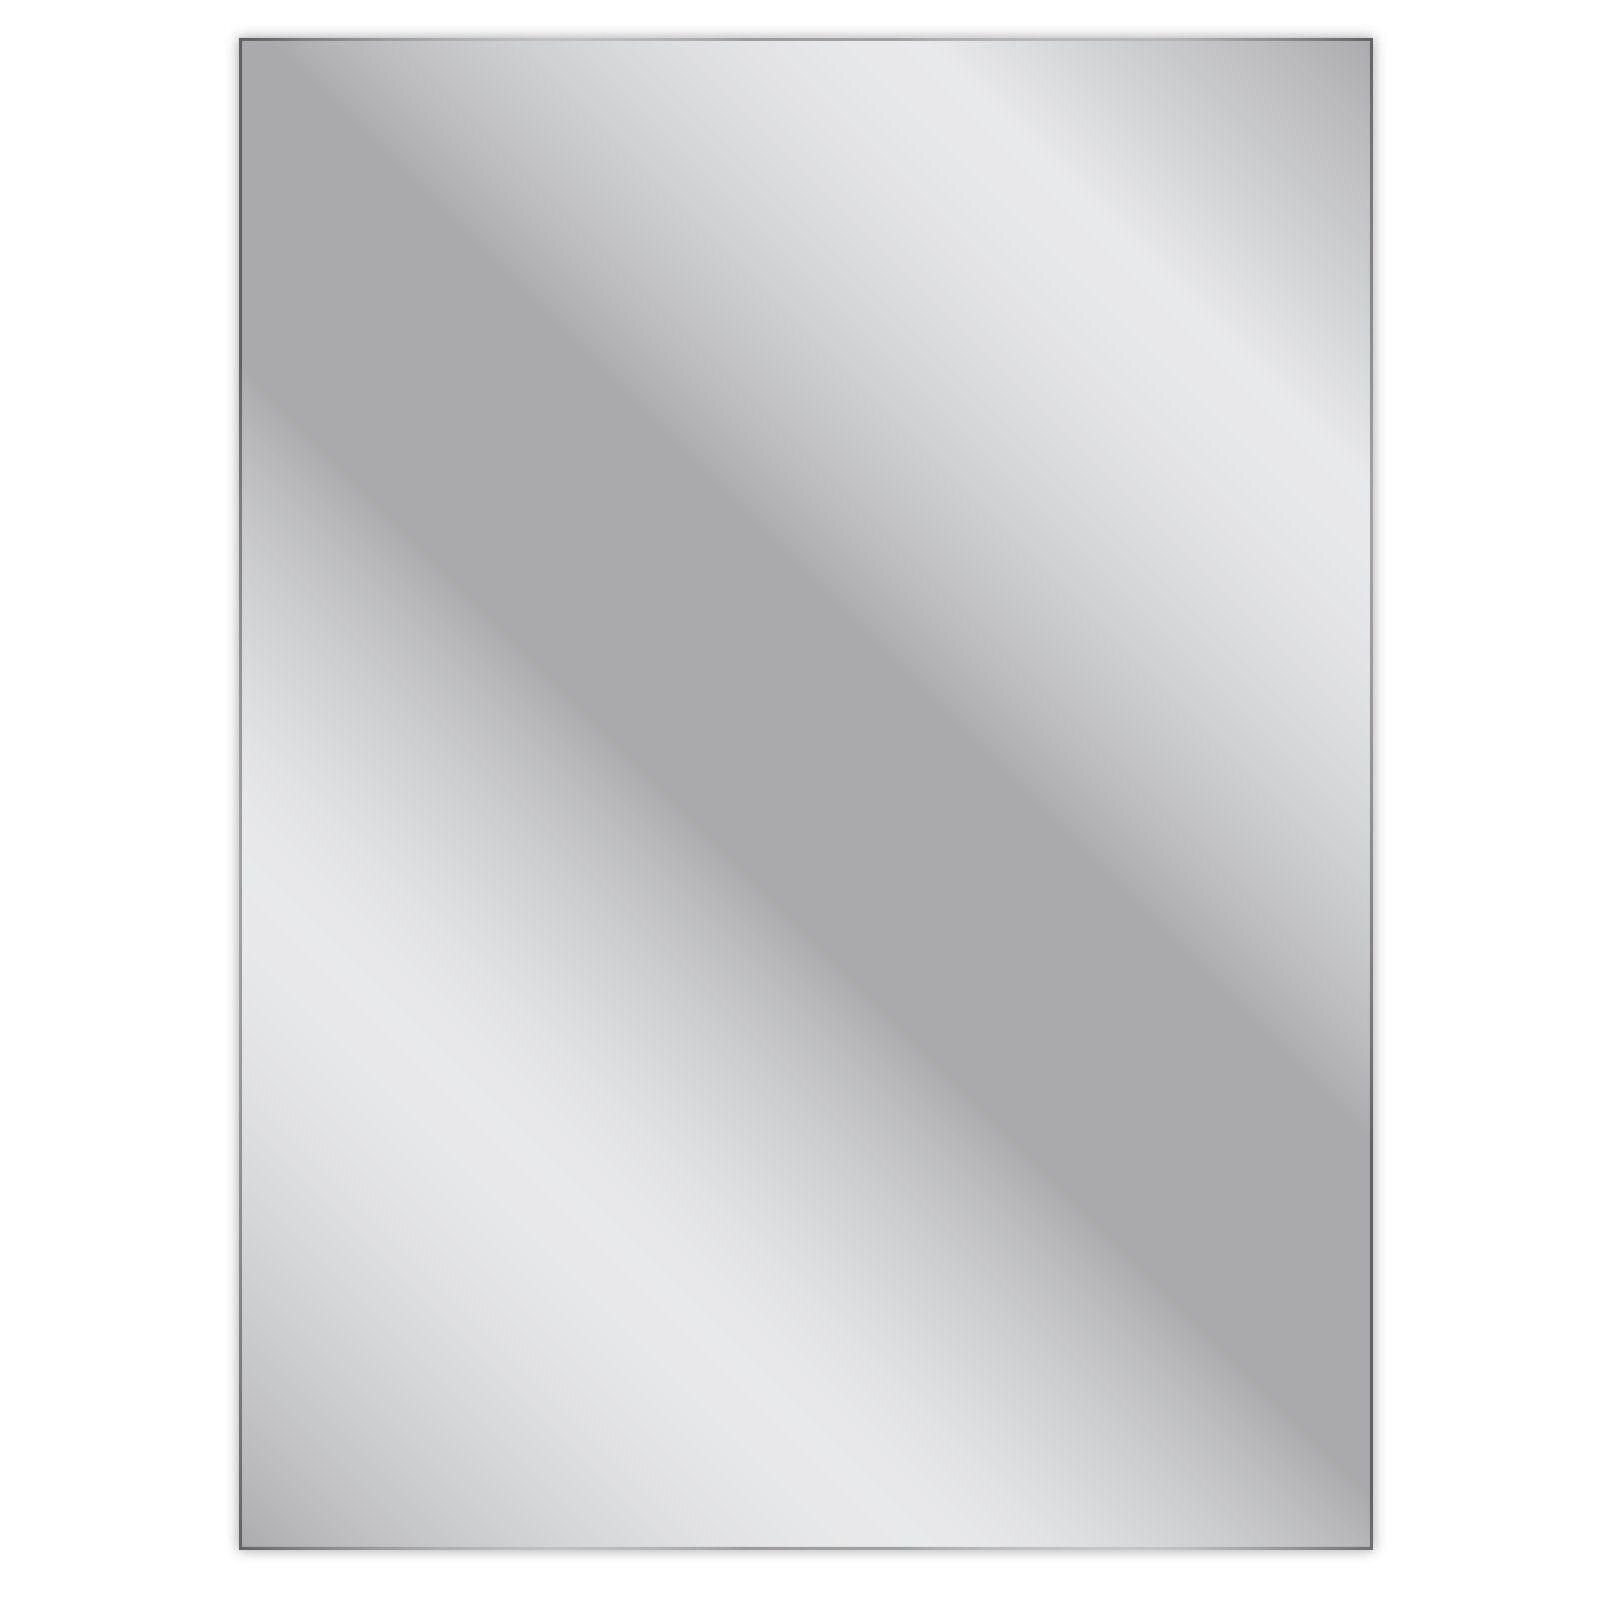 Living Elements 1200 x 900 x 5mm Flat Edge Mirror